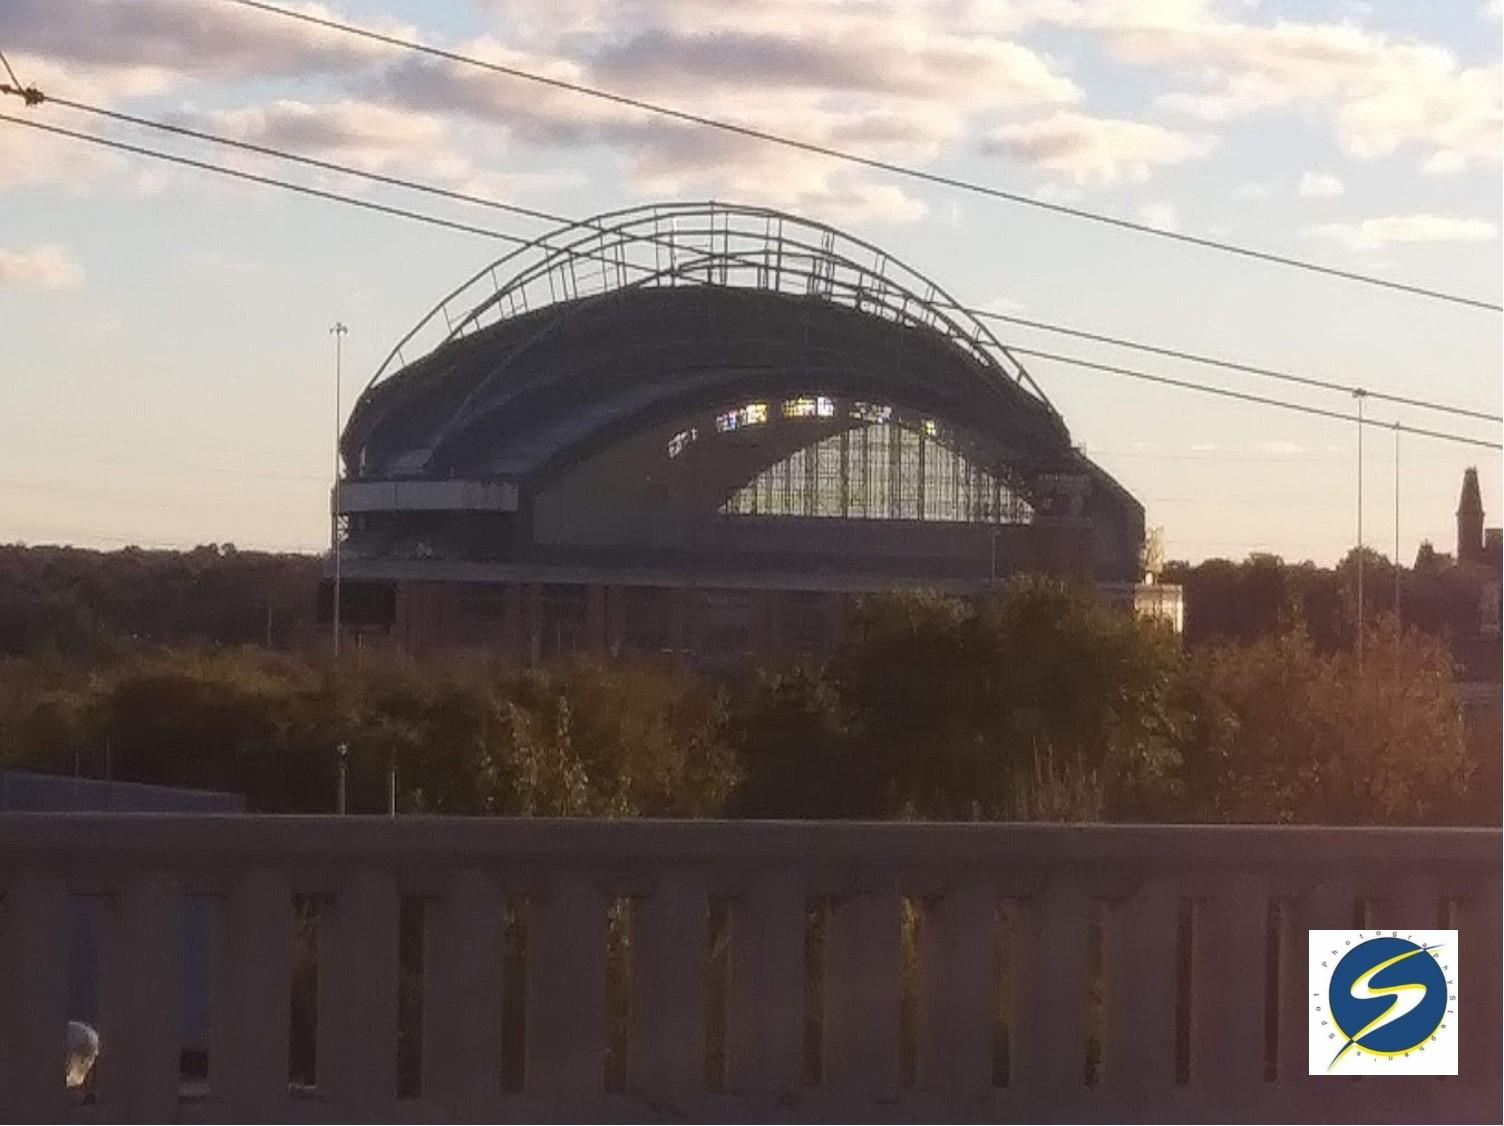 SSP_MillerPark_MilwaukeeBrewersPostSeason_2018